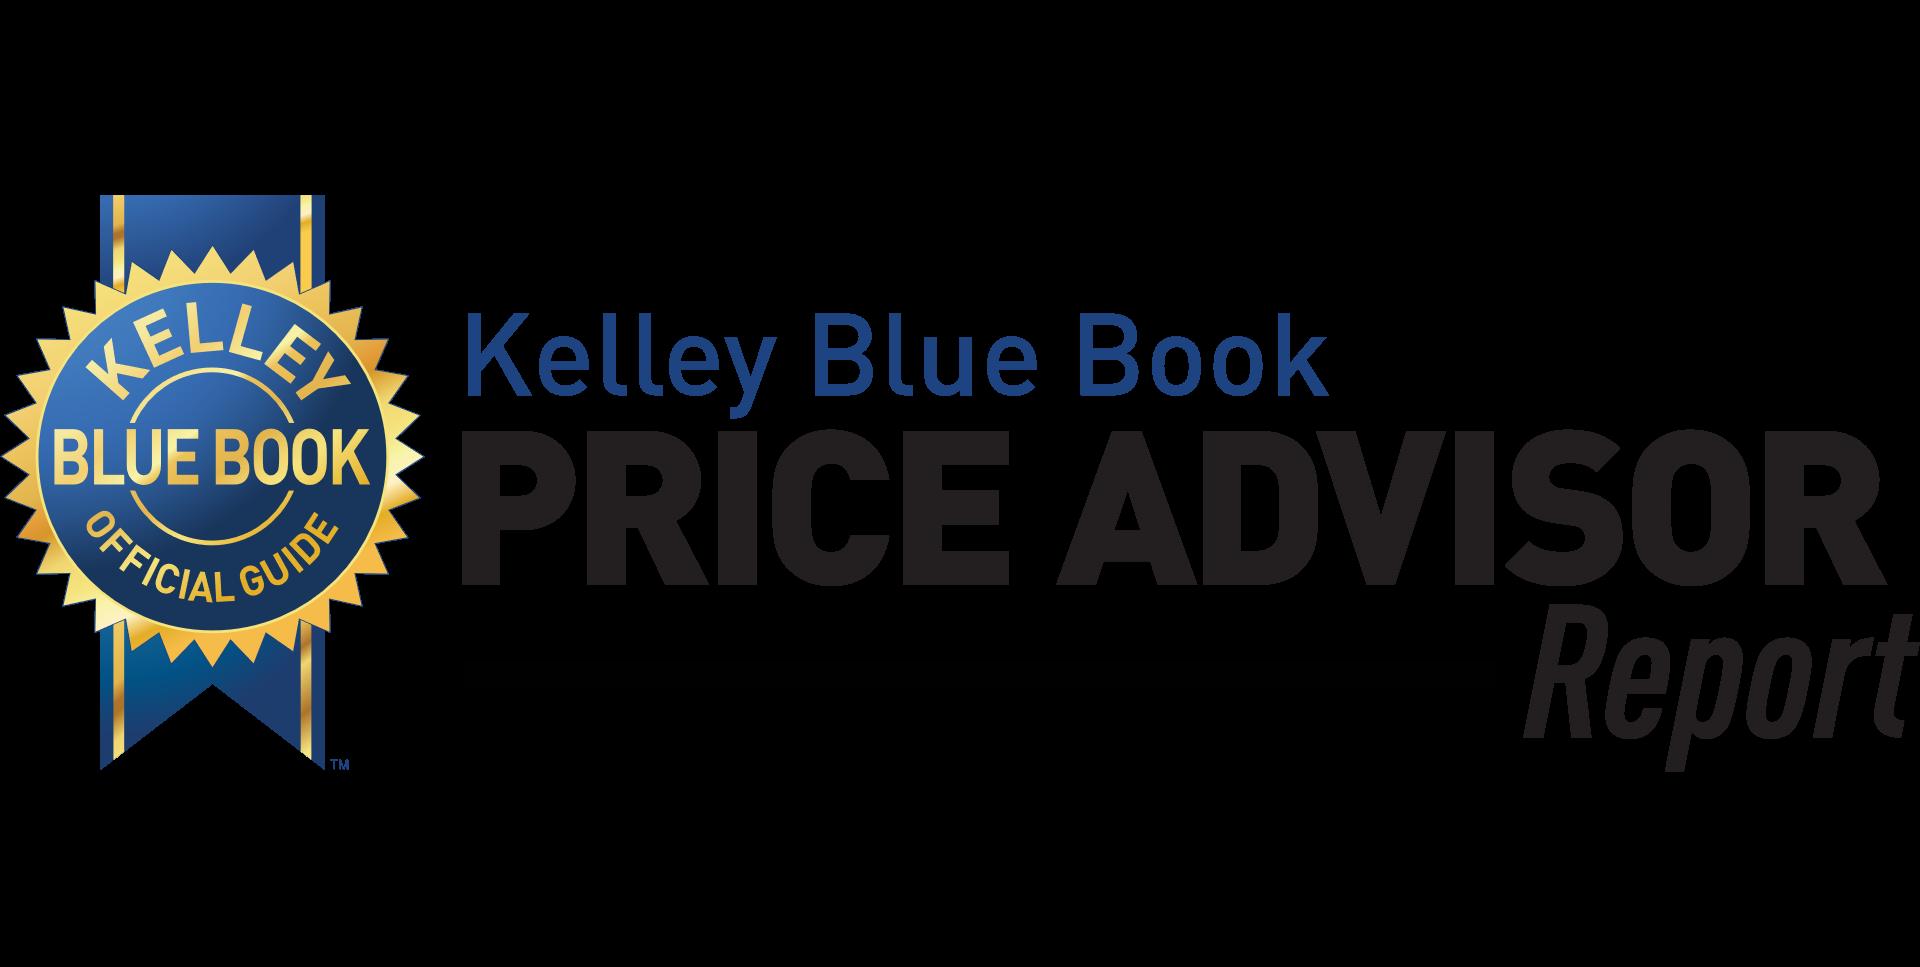 Kelly Blue Book Price Advisor Report